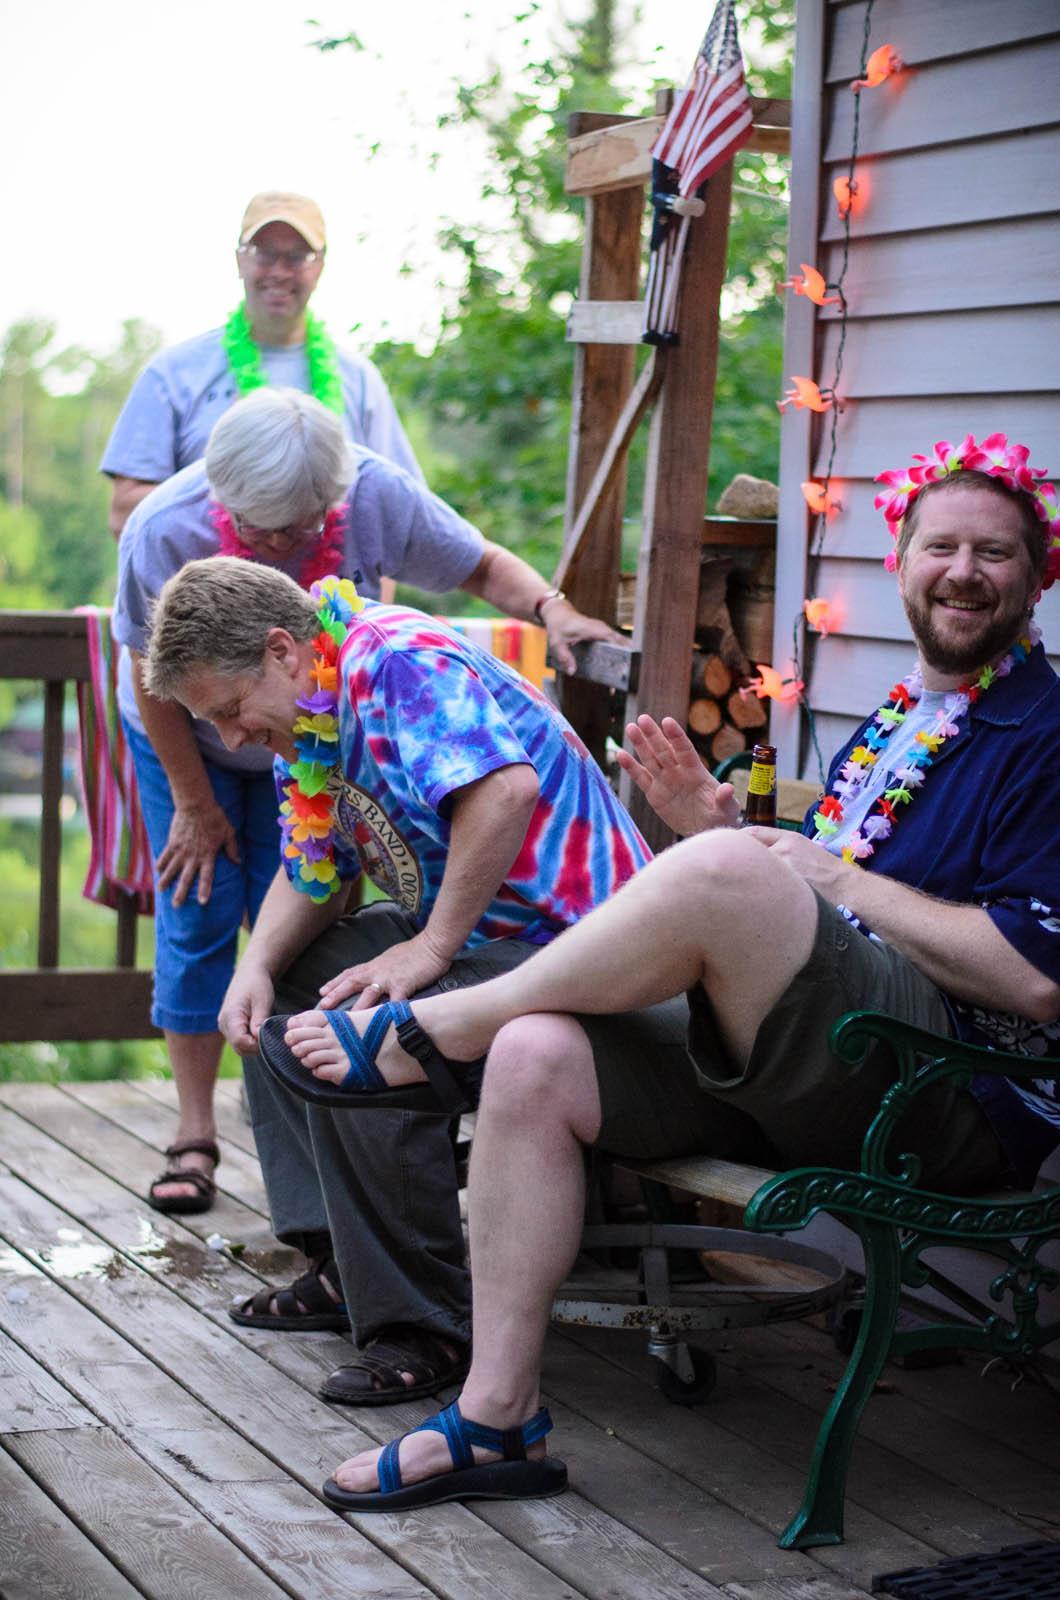 Somebody always spills their drink // Wisconsin // July 2014